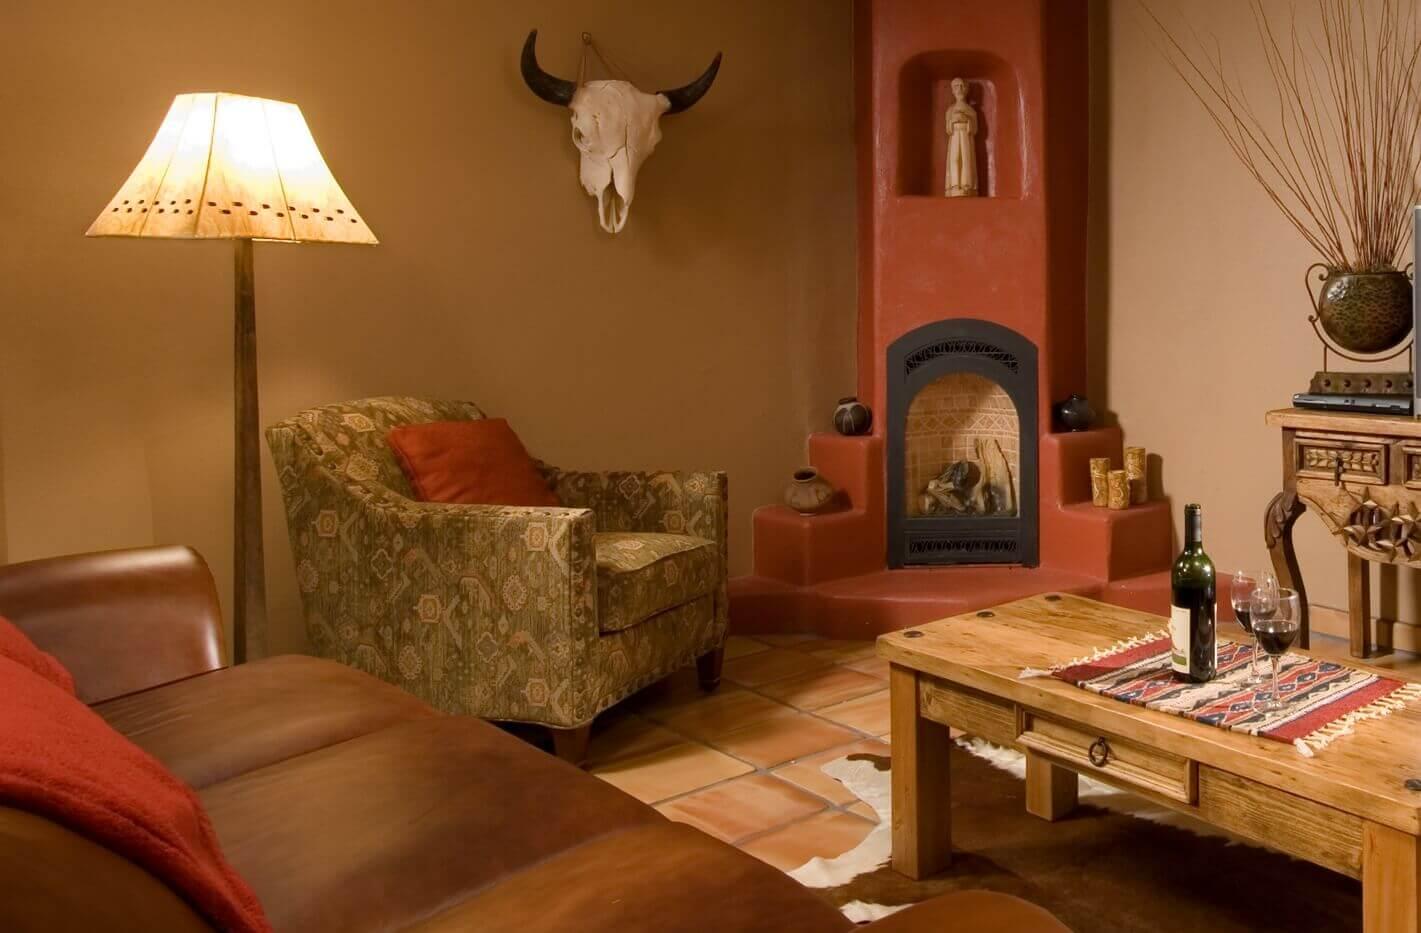 living room inside a room